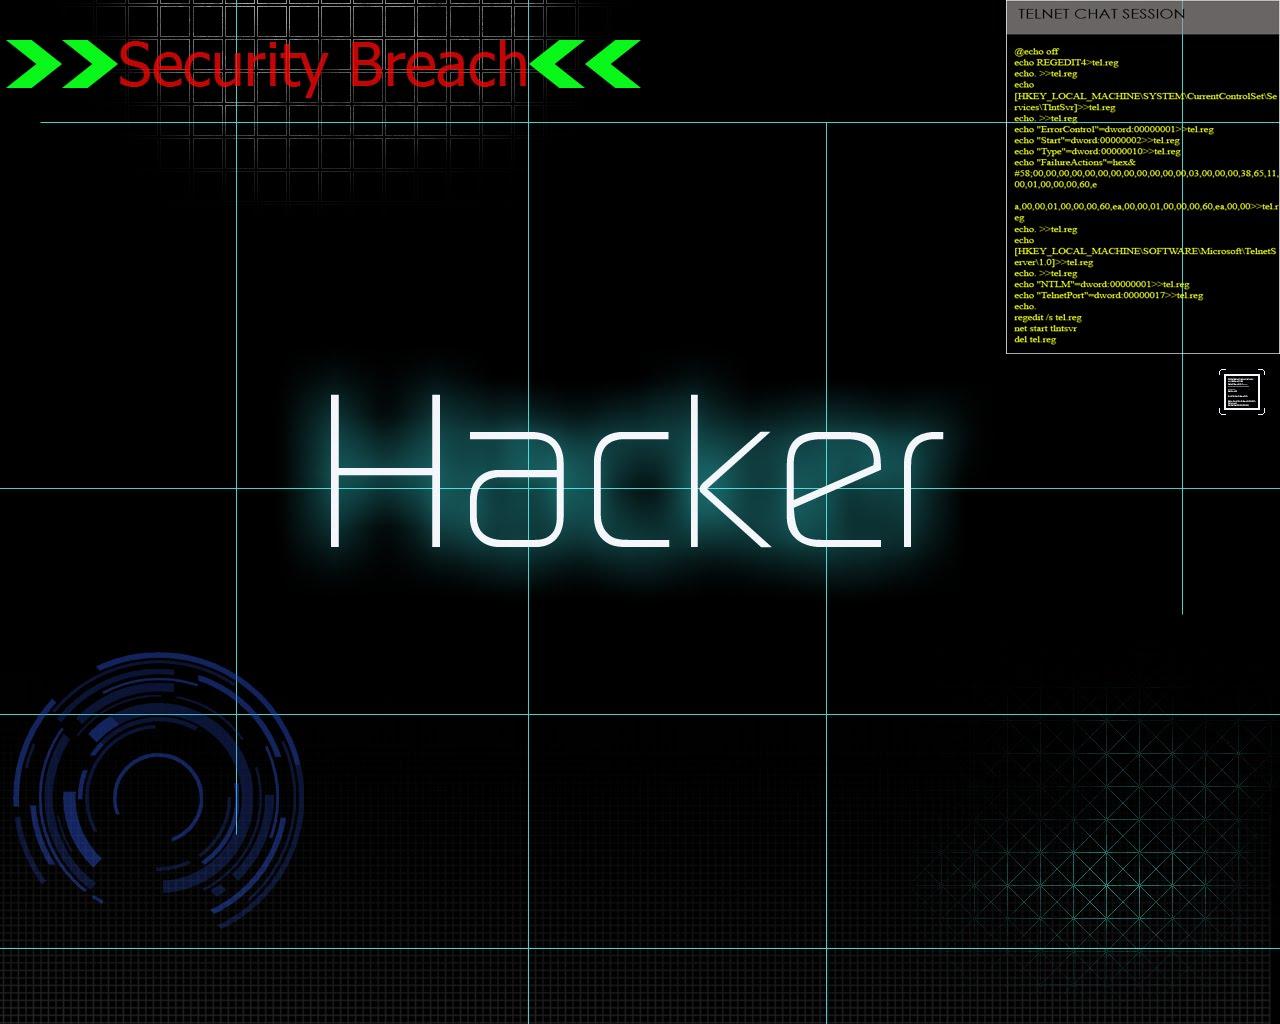 http://3.bp.blogspot.com/-UkxdYZ6LMEc/TYR8UktCE5I/AAAAAAAAAAg/tqP21otsBVs/s1600/Hacker_Wallpaper_1280x1024_by_Pengo1.jpg